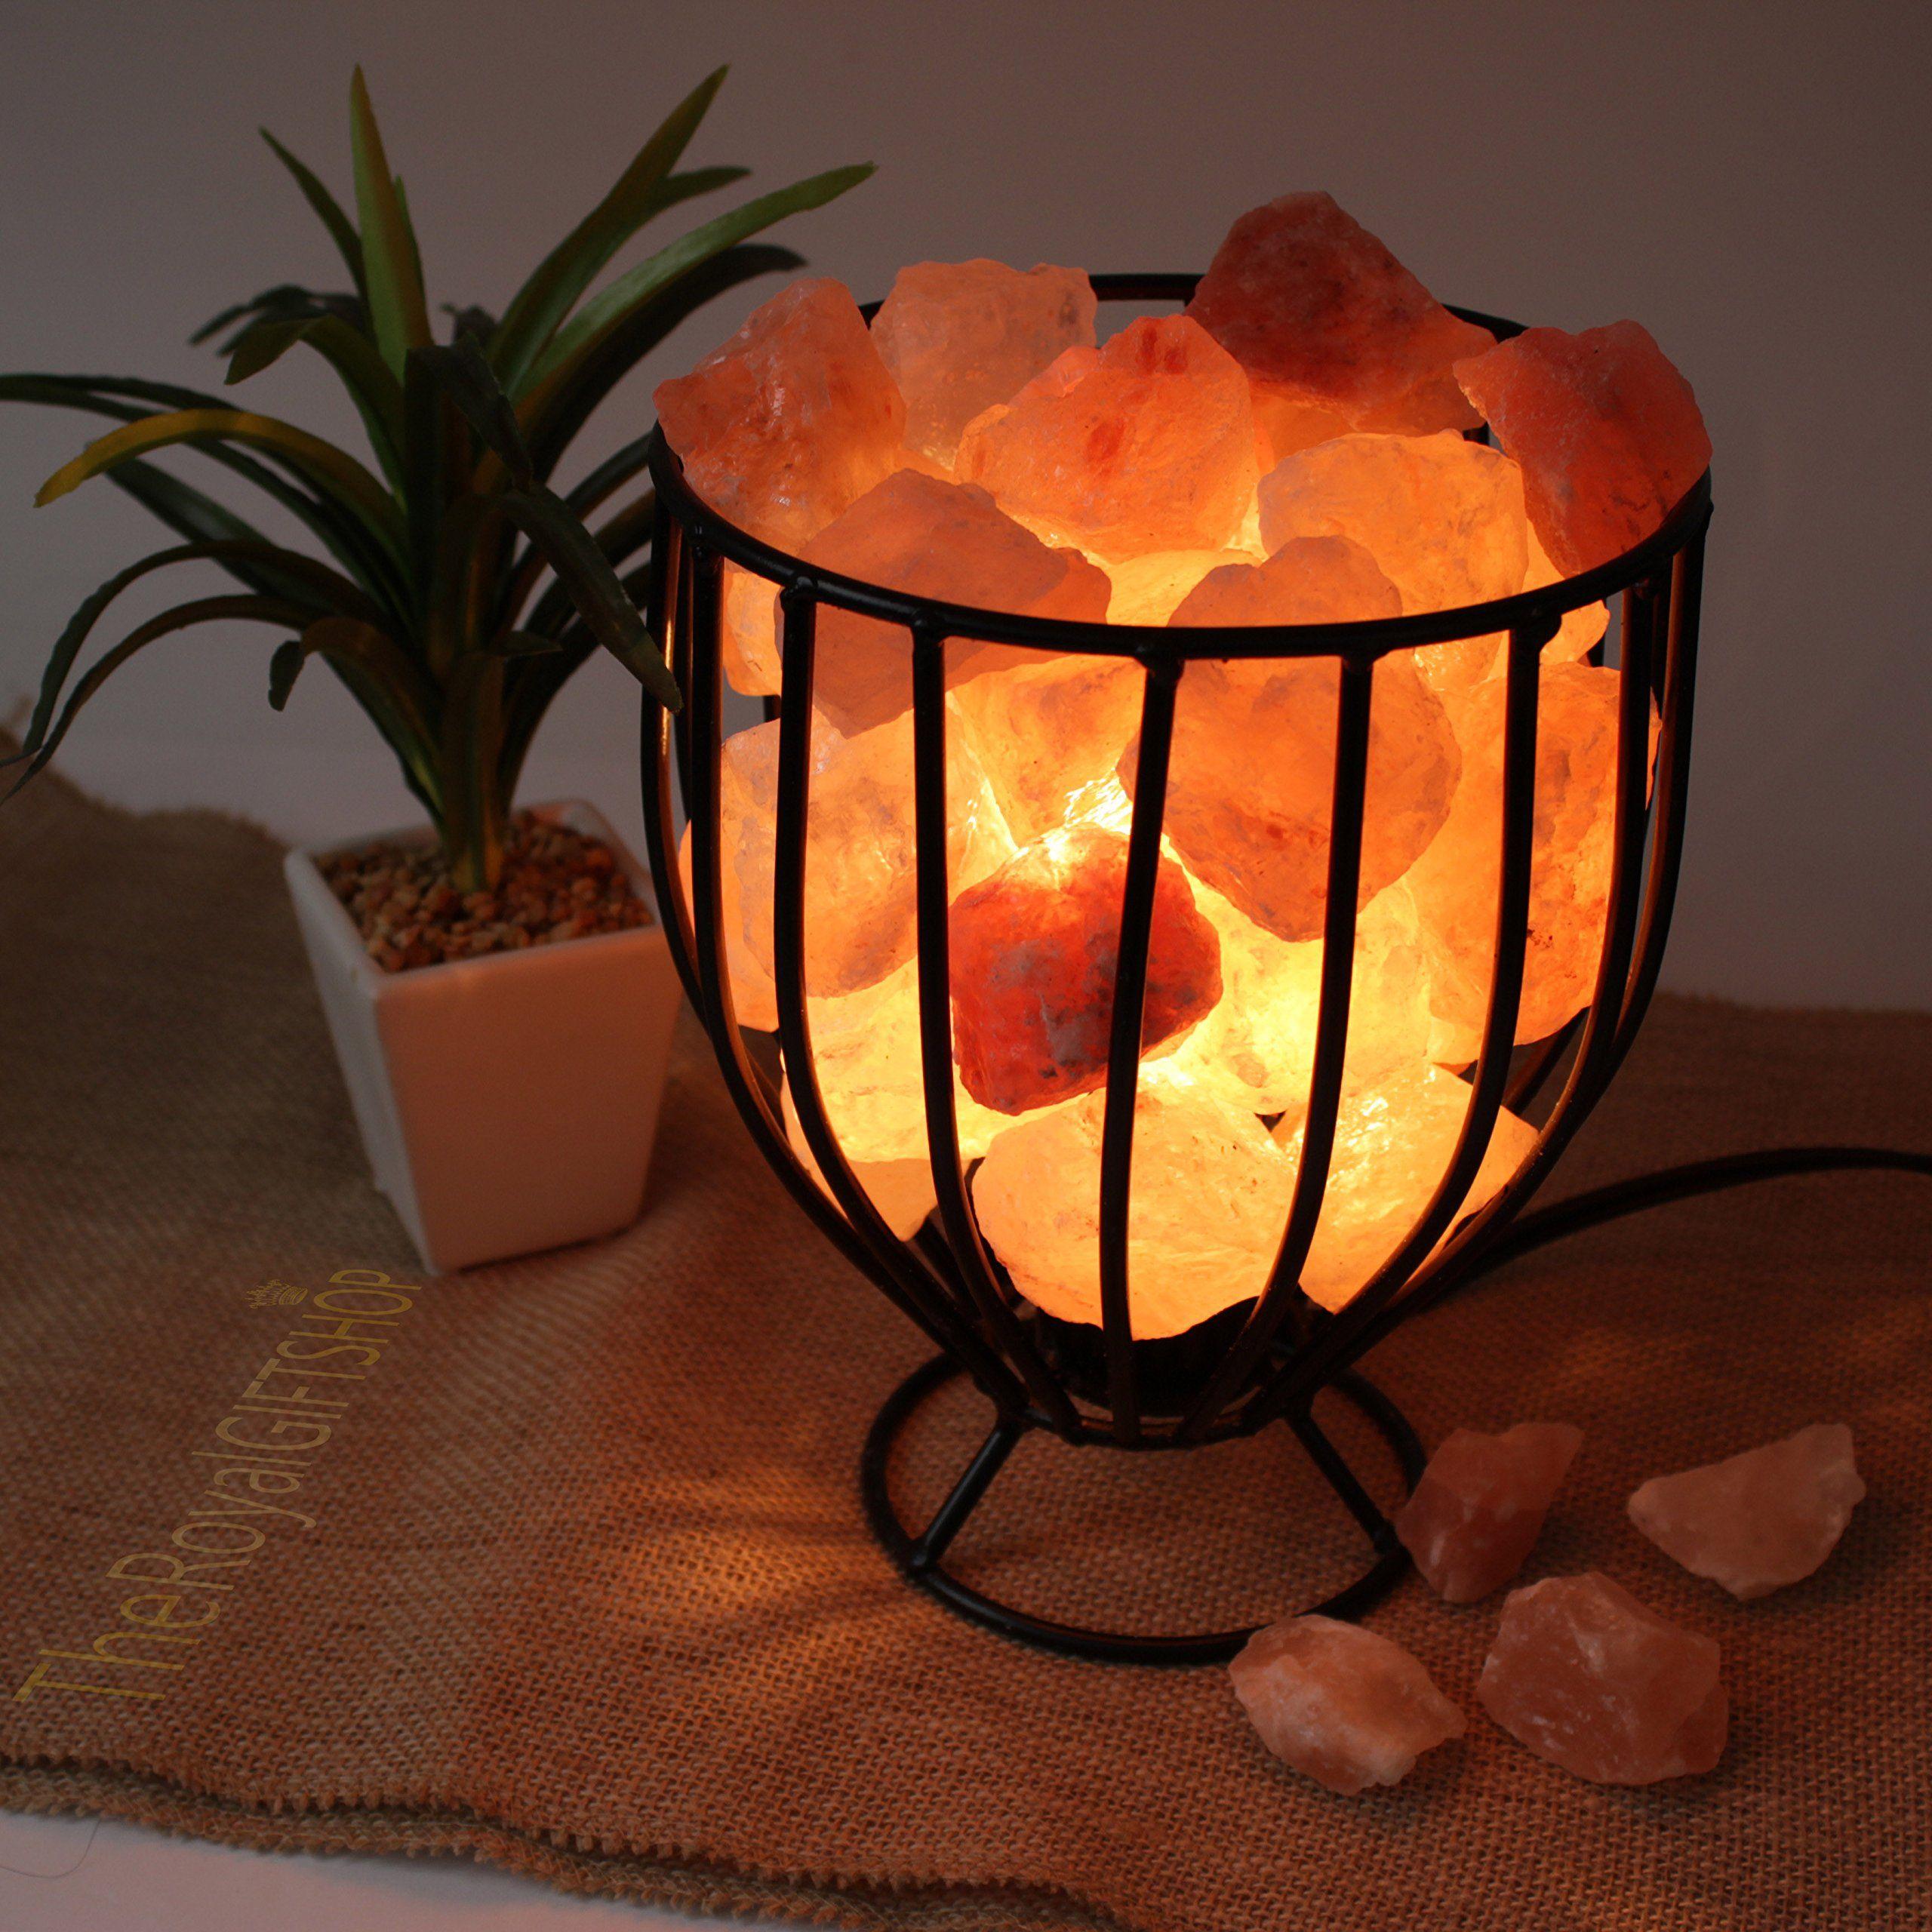 Genuine Glowing Himalayan Salt Lamp Wrought Iron Basket With Ul